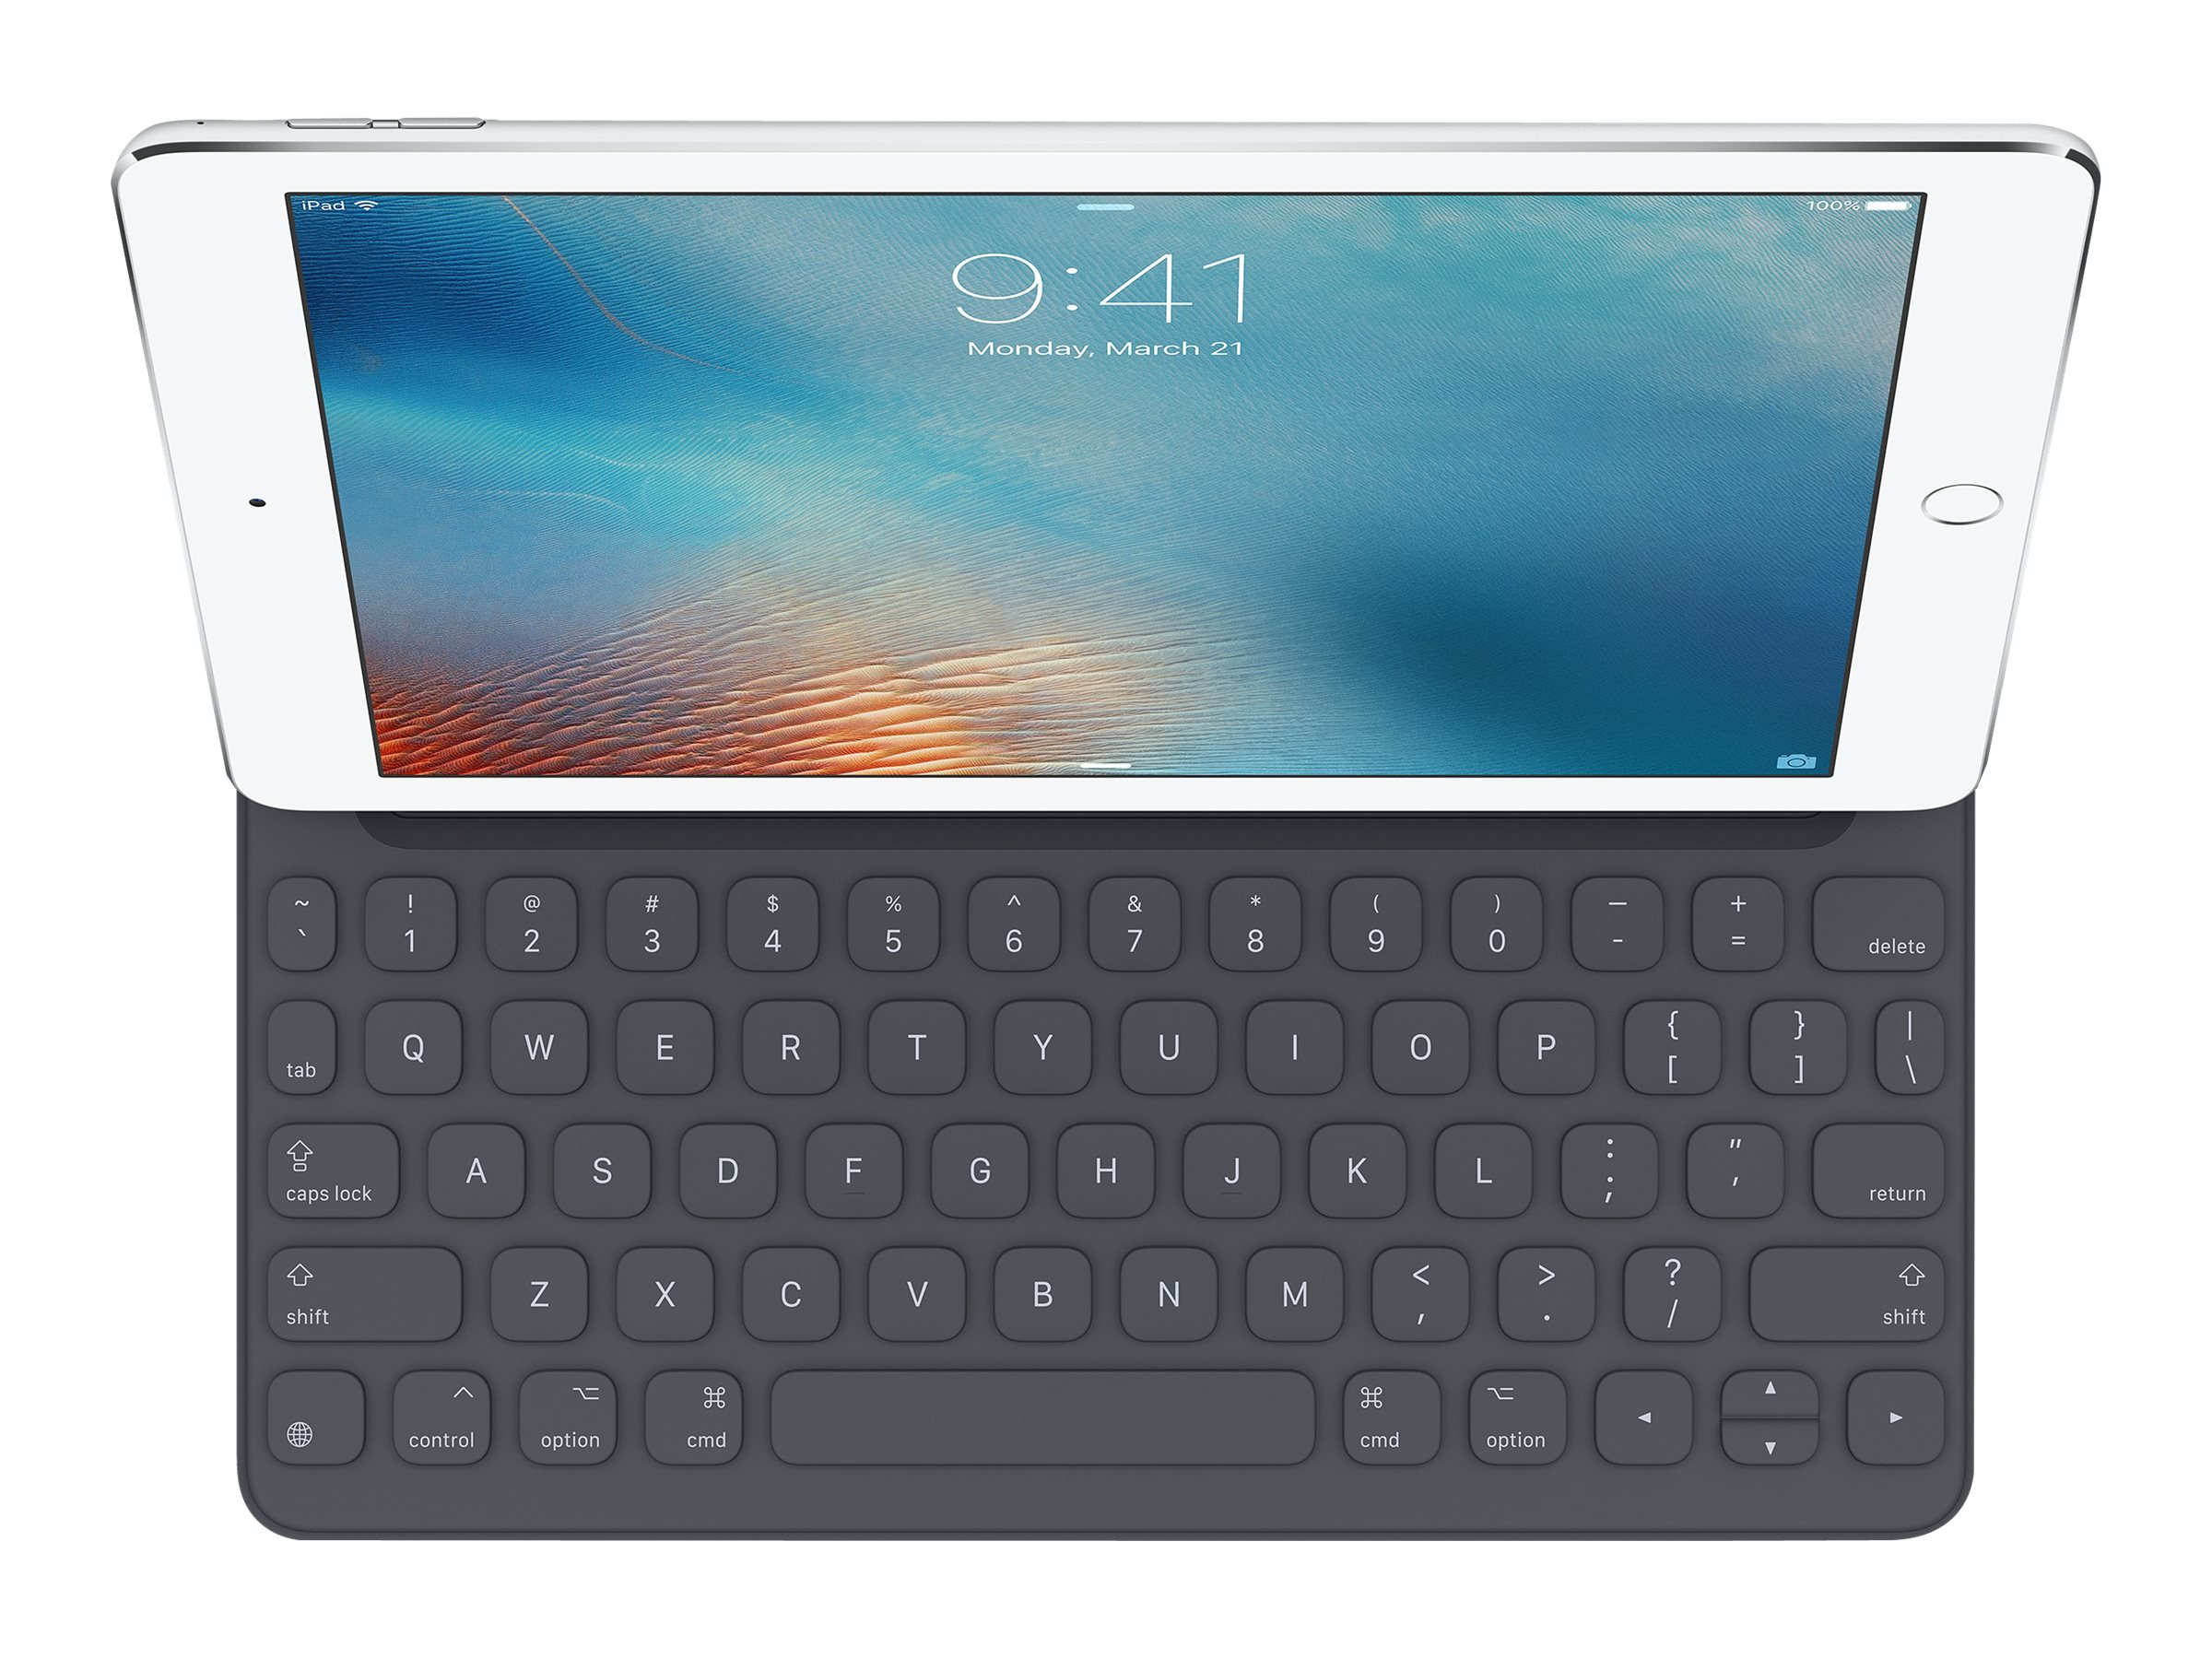 Apple Ipad Pro 129 Retina Display 512gb Wifi Cellular Silver 105 New Tablet Only Mplk2ll A